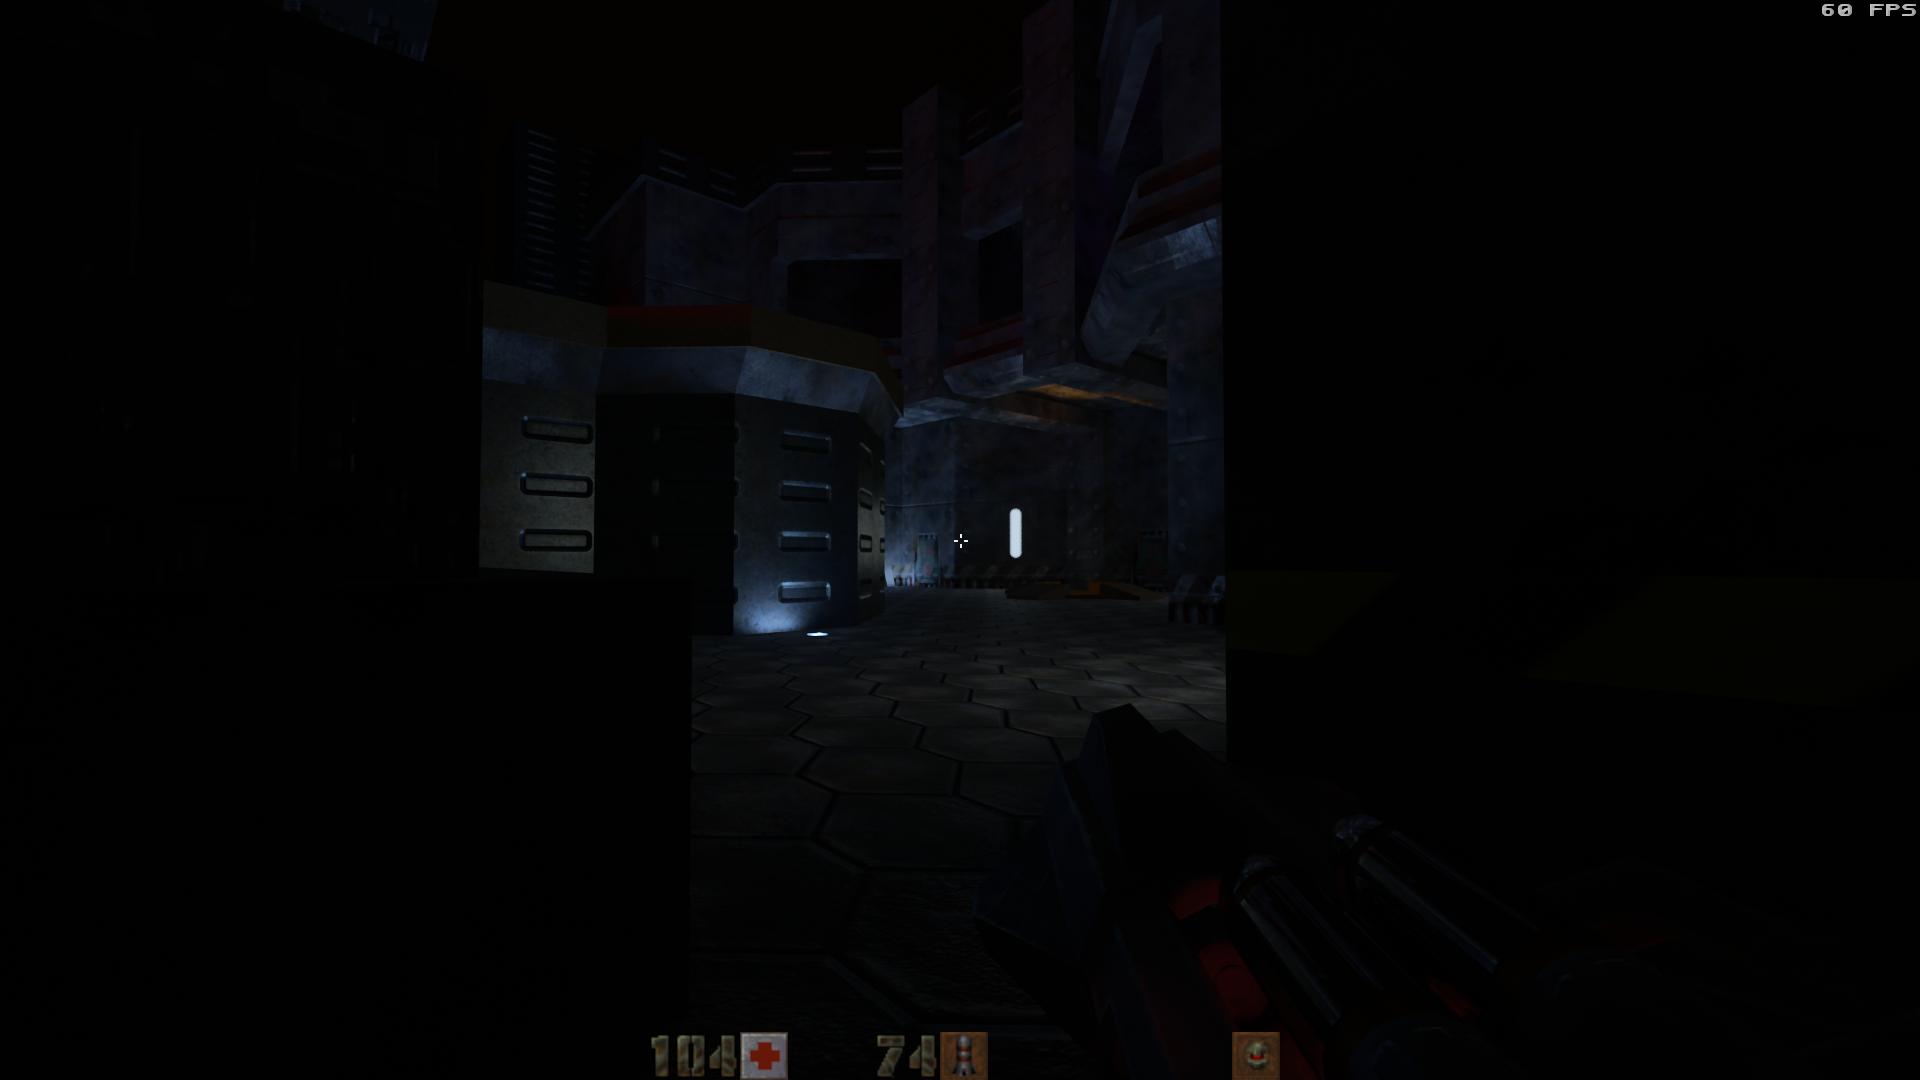 Quake 2 RTX Remaster Screenshot 2019.11.28 - 19.16.27.18.png